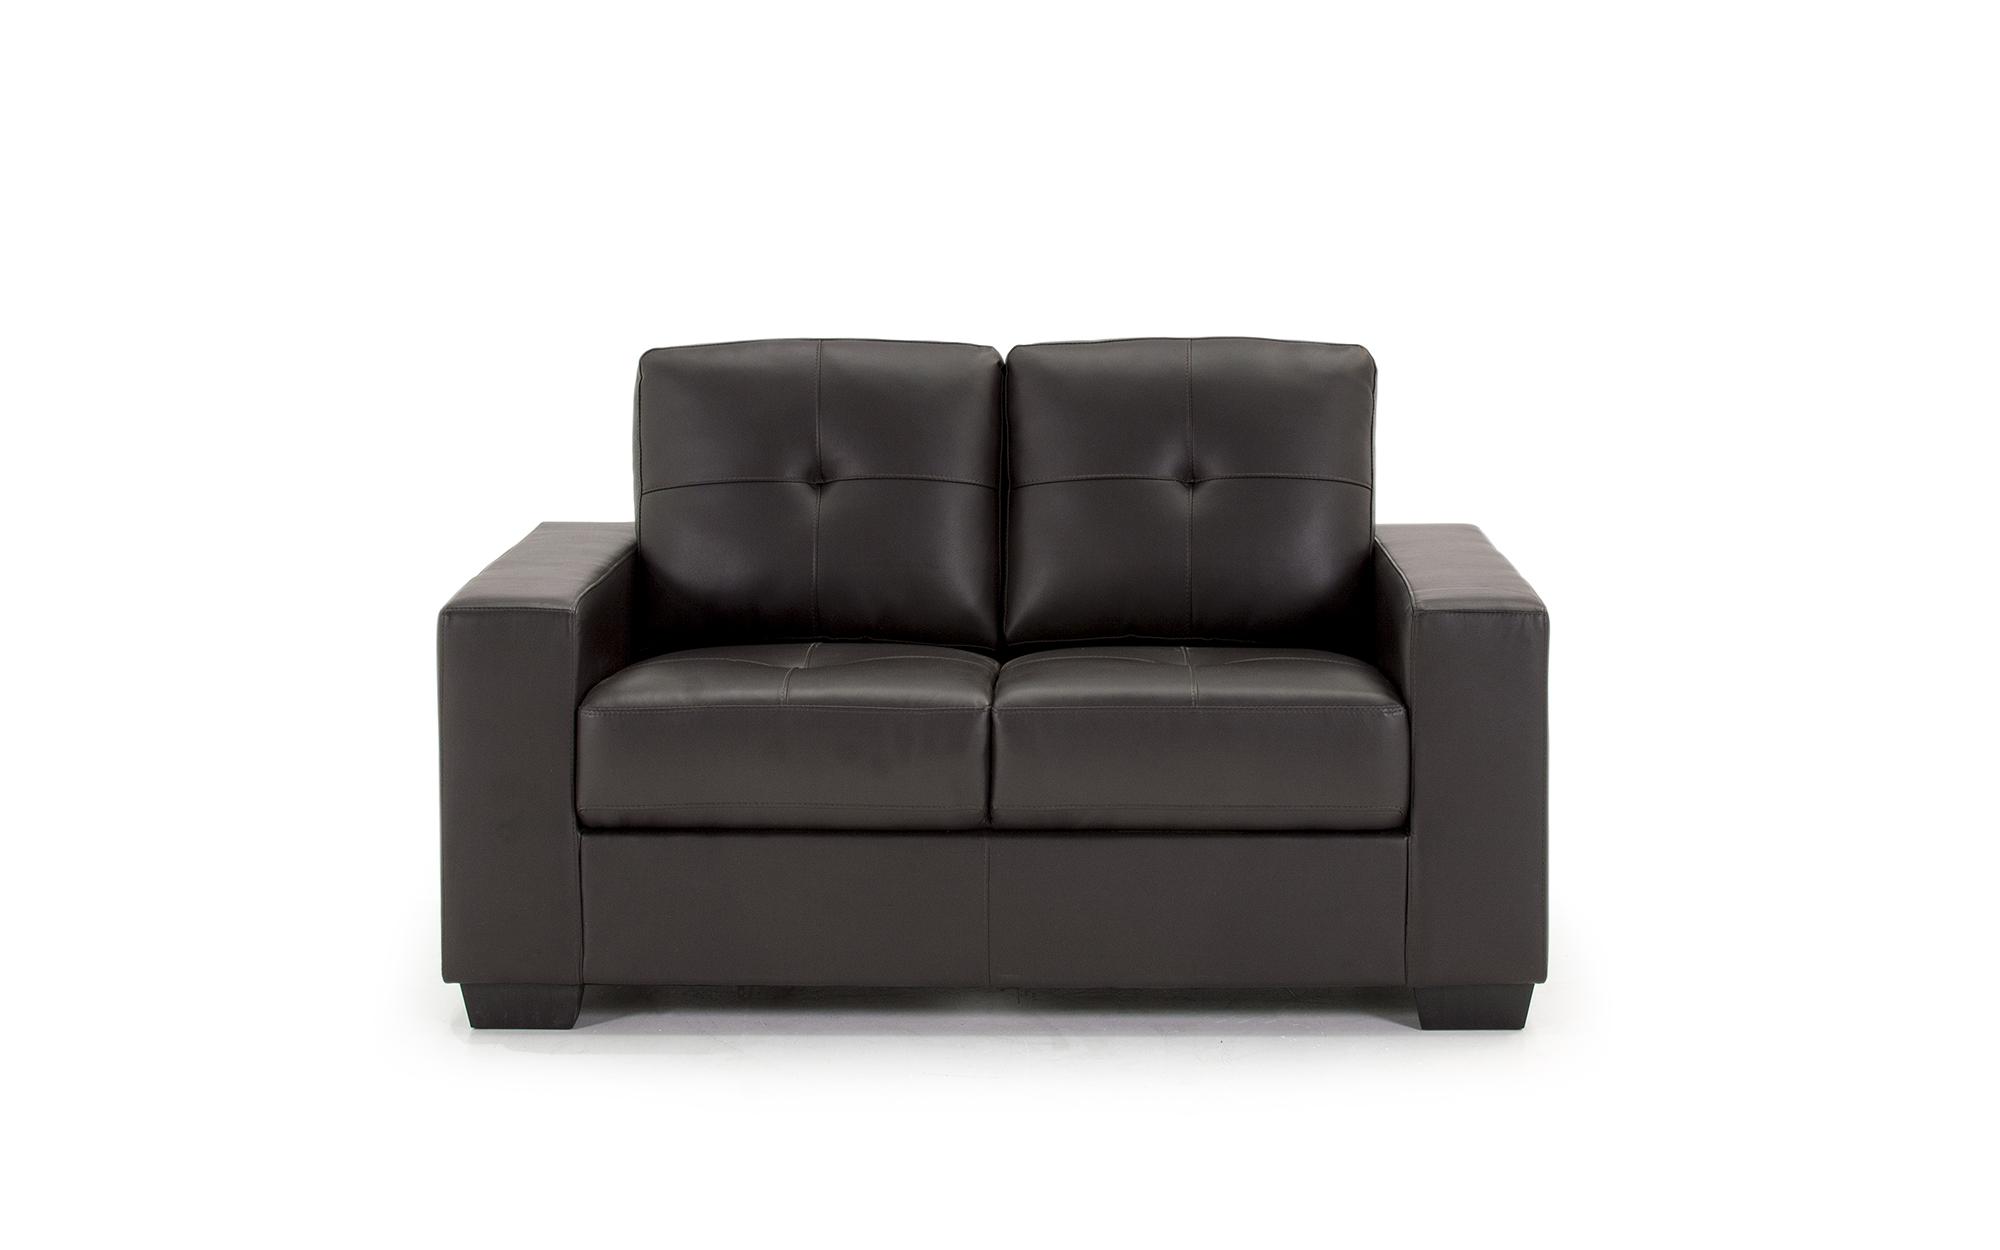 Canapea fixa 2 locuri Gemona Brown